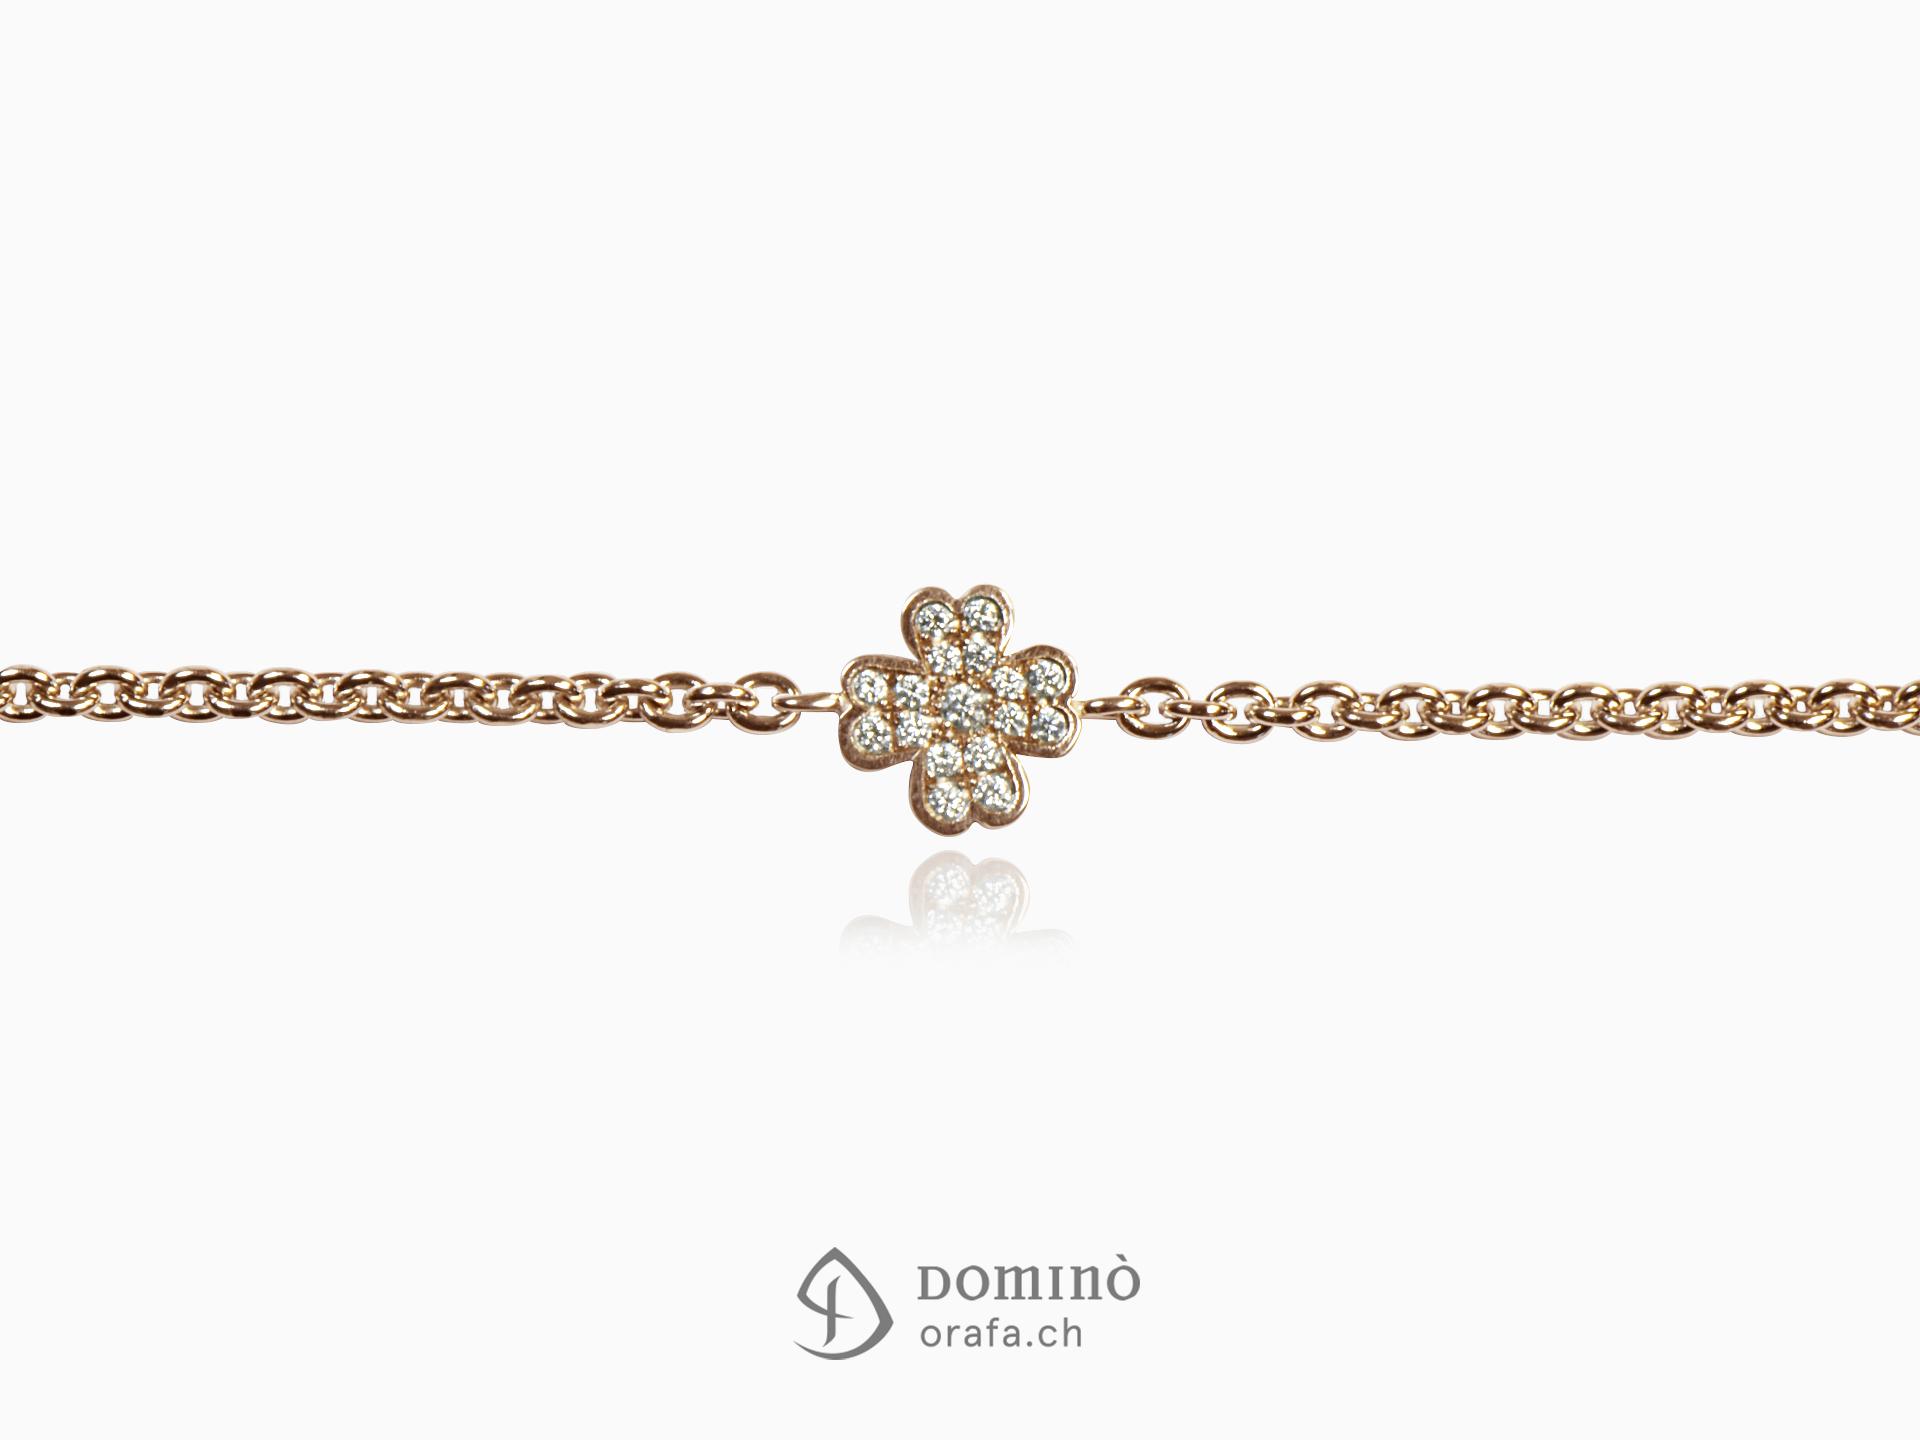 Four leaf clover bracelet with diamonds